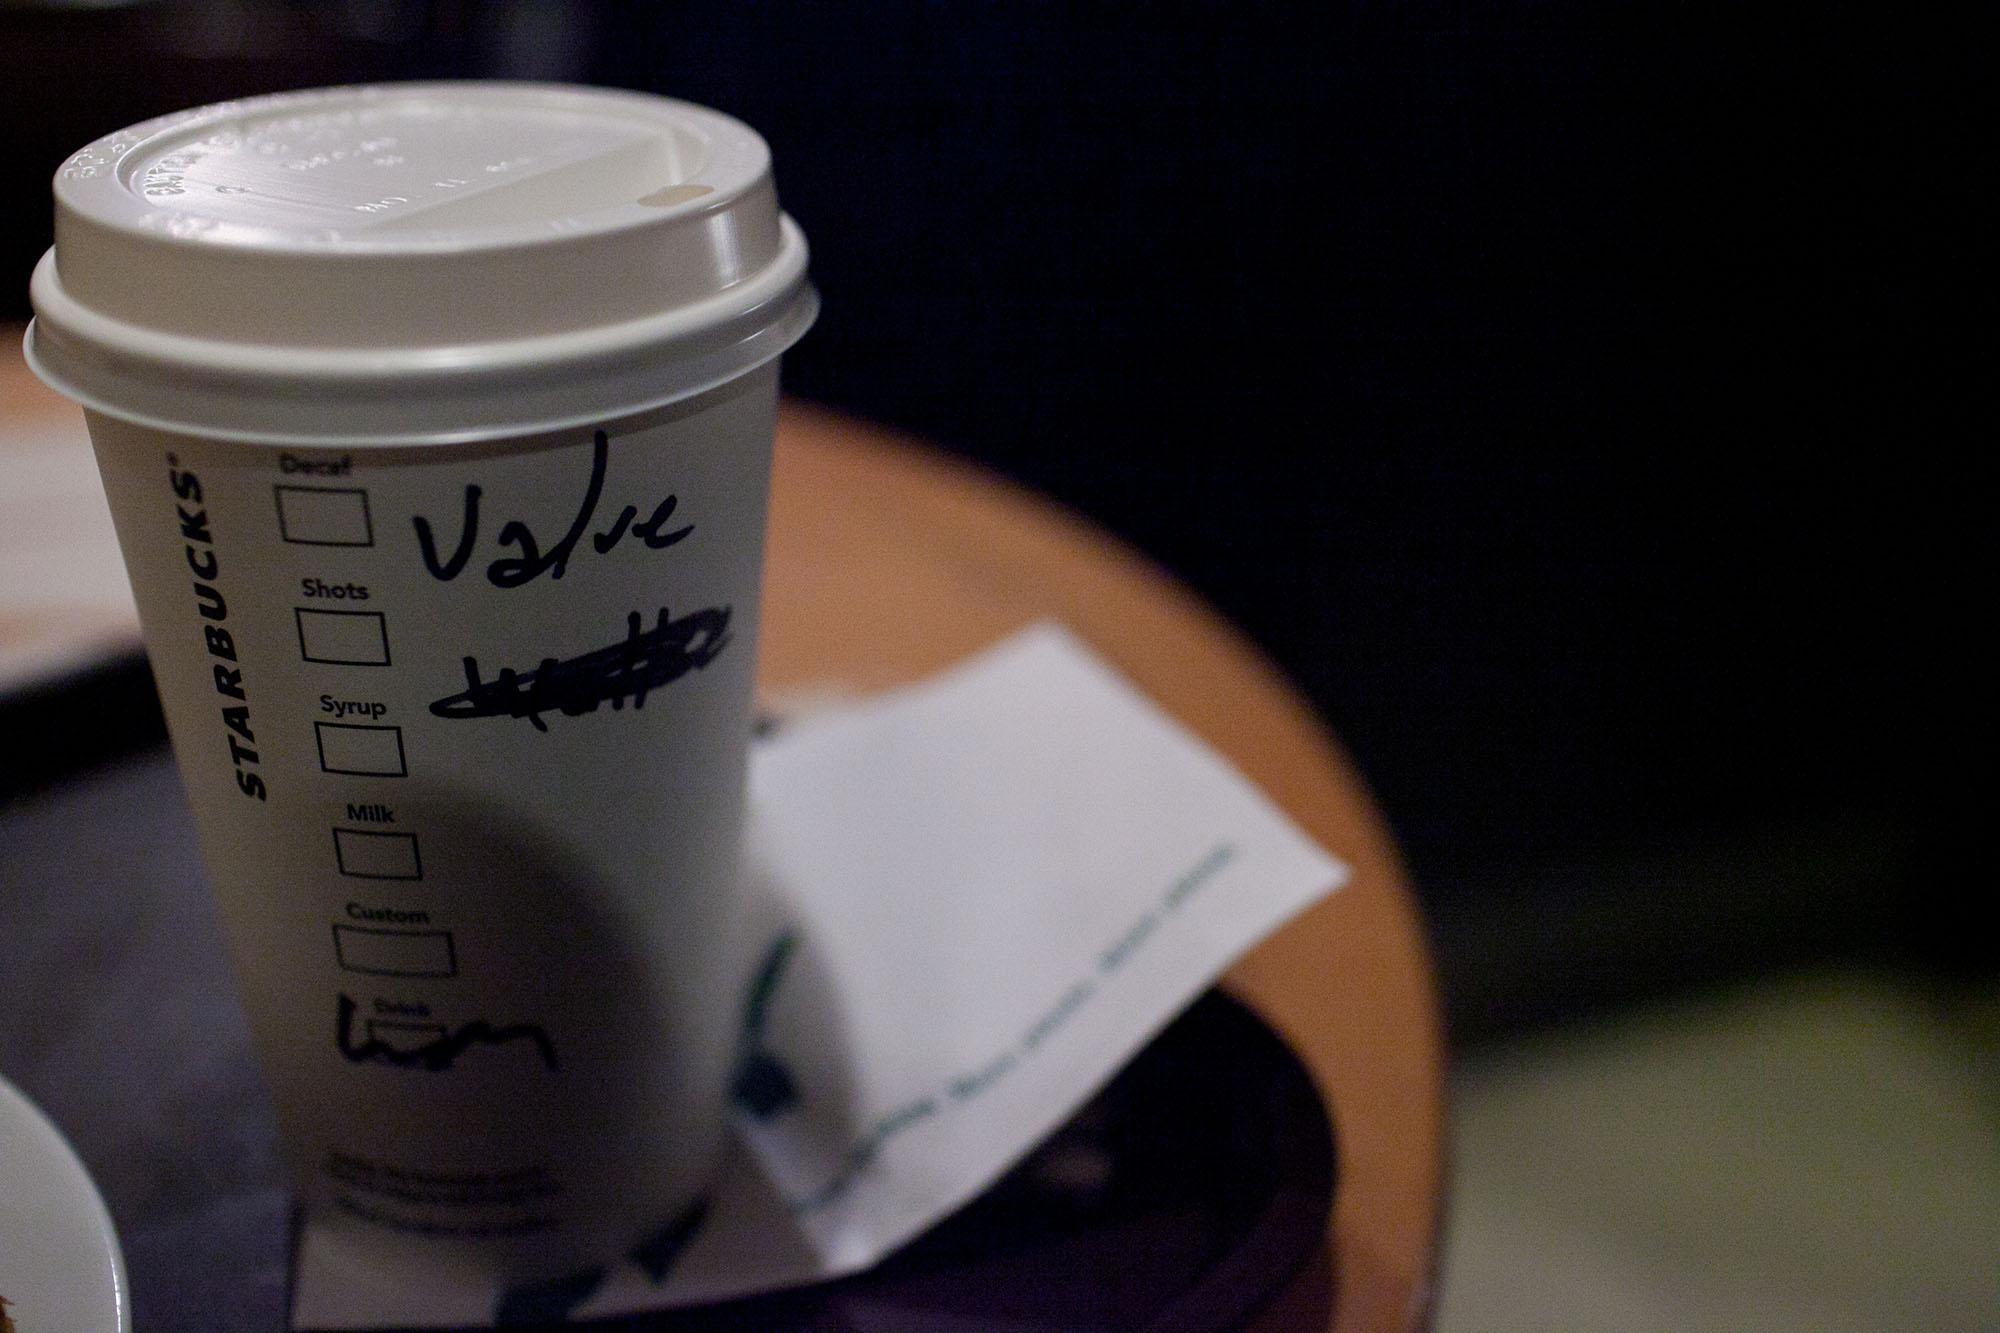 Starbucks in Istanbul, Turkey